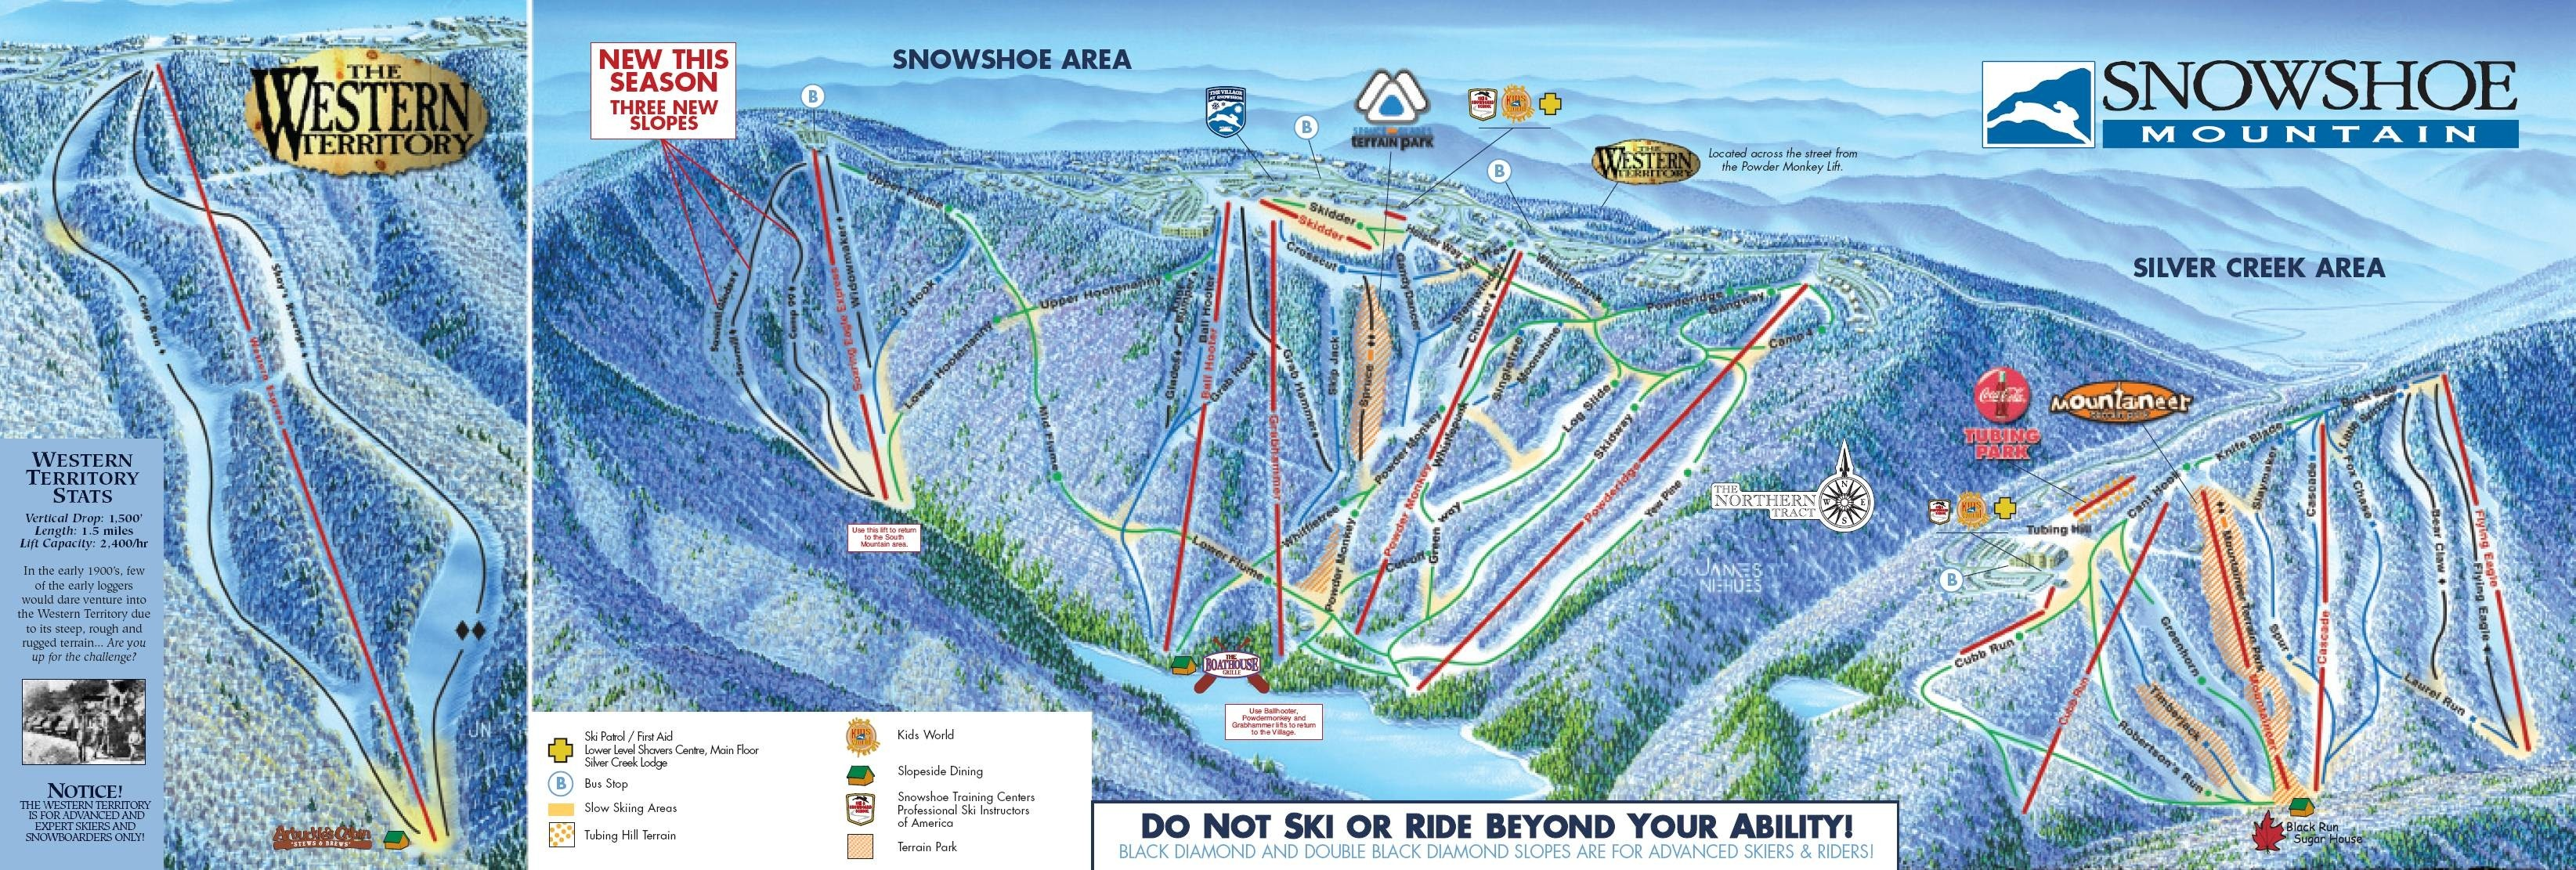 Snowshoe Mountain Trail Map Piste Map Panoramic